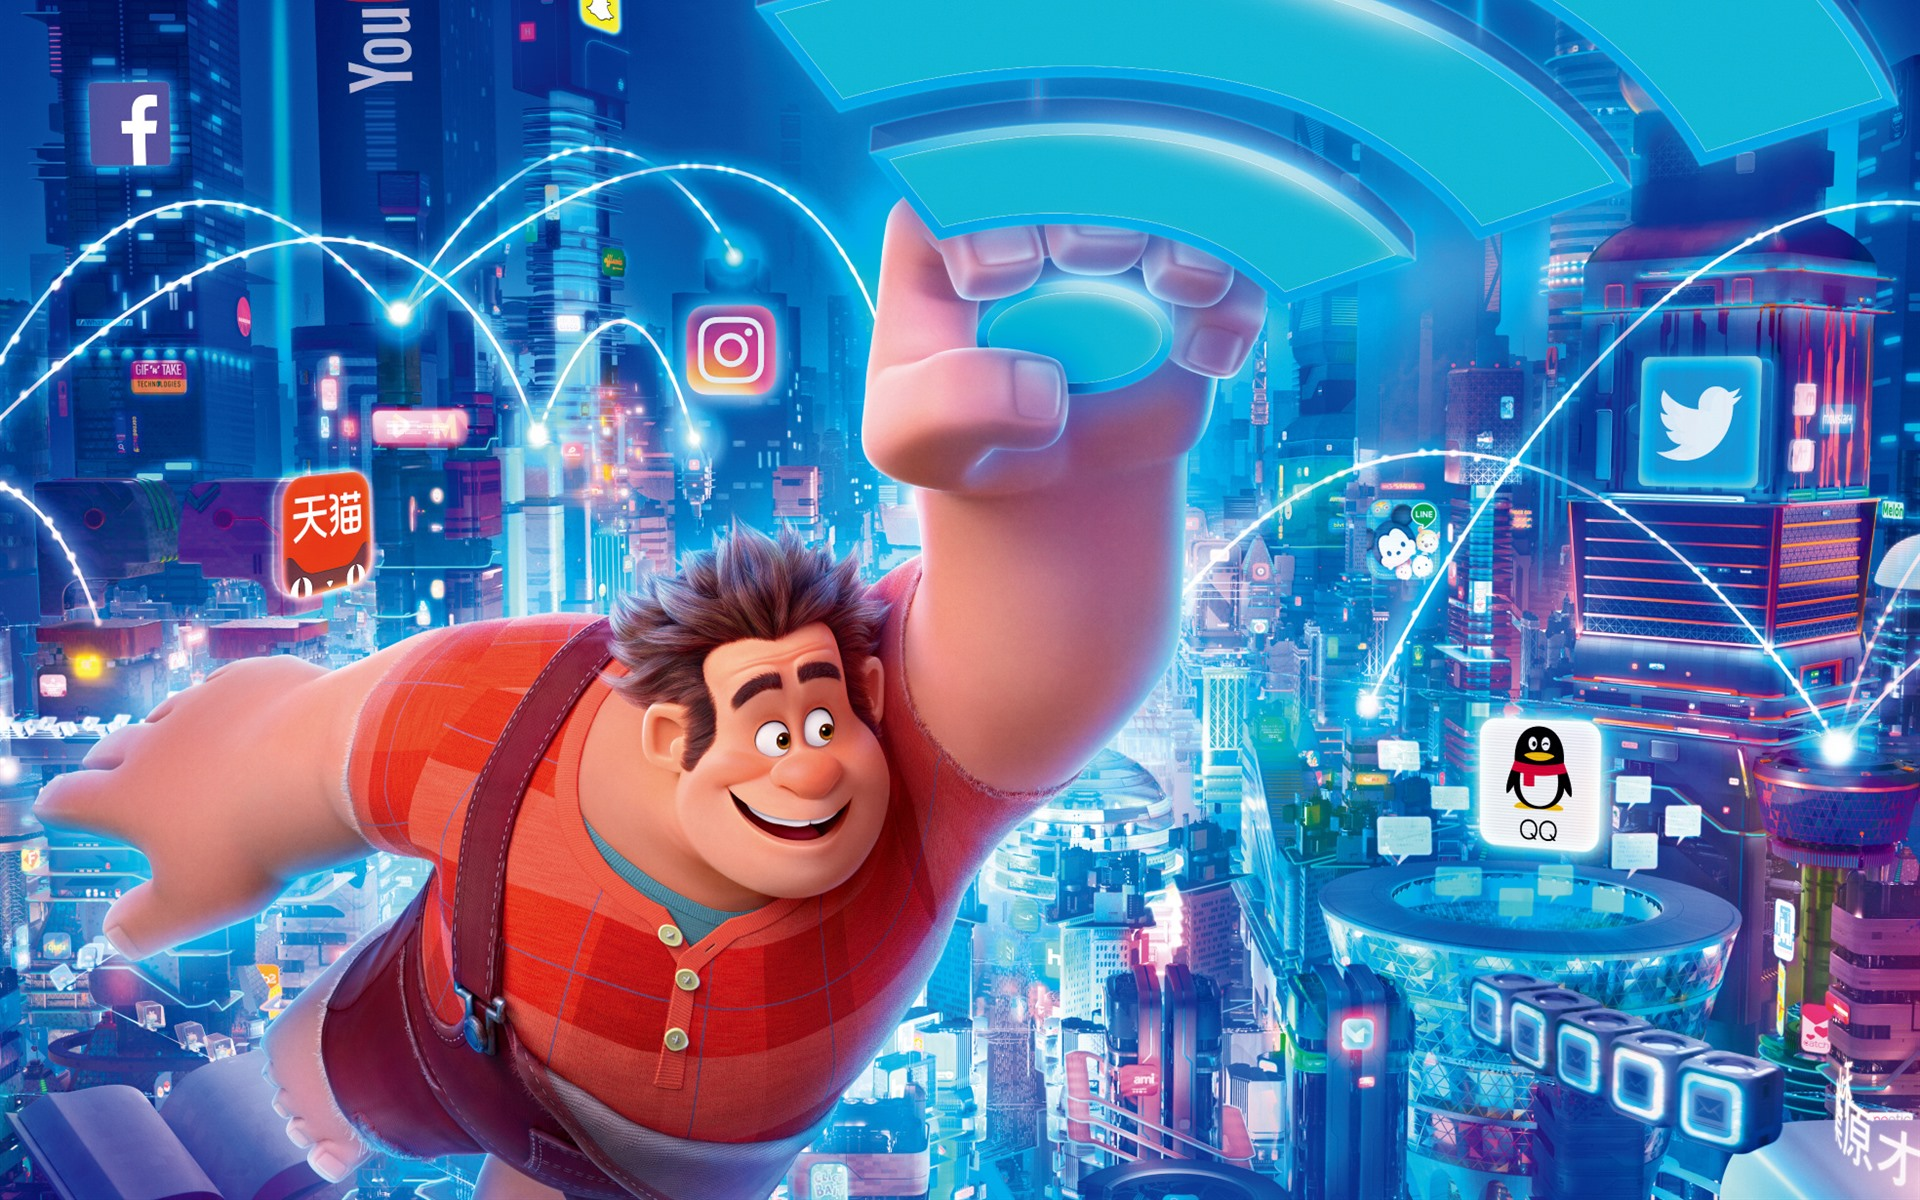 Wreck It Ralph Animation Movie 4k Hd Desktop Wallpaper For: 배경 화면 디즈니 영화, 주먹왕 랄프2 1920x1200 HD 그림, 이미지